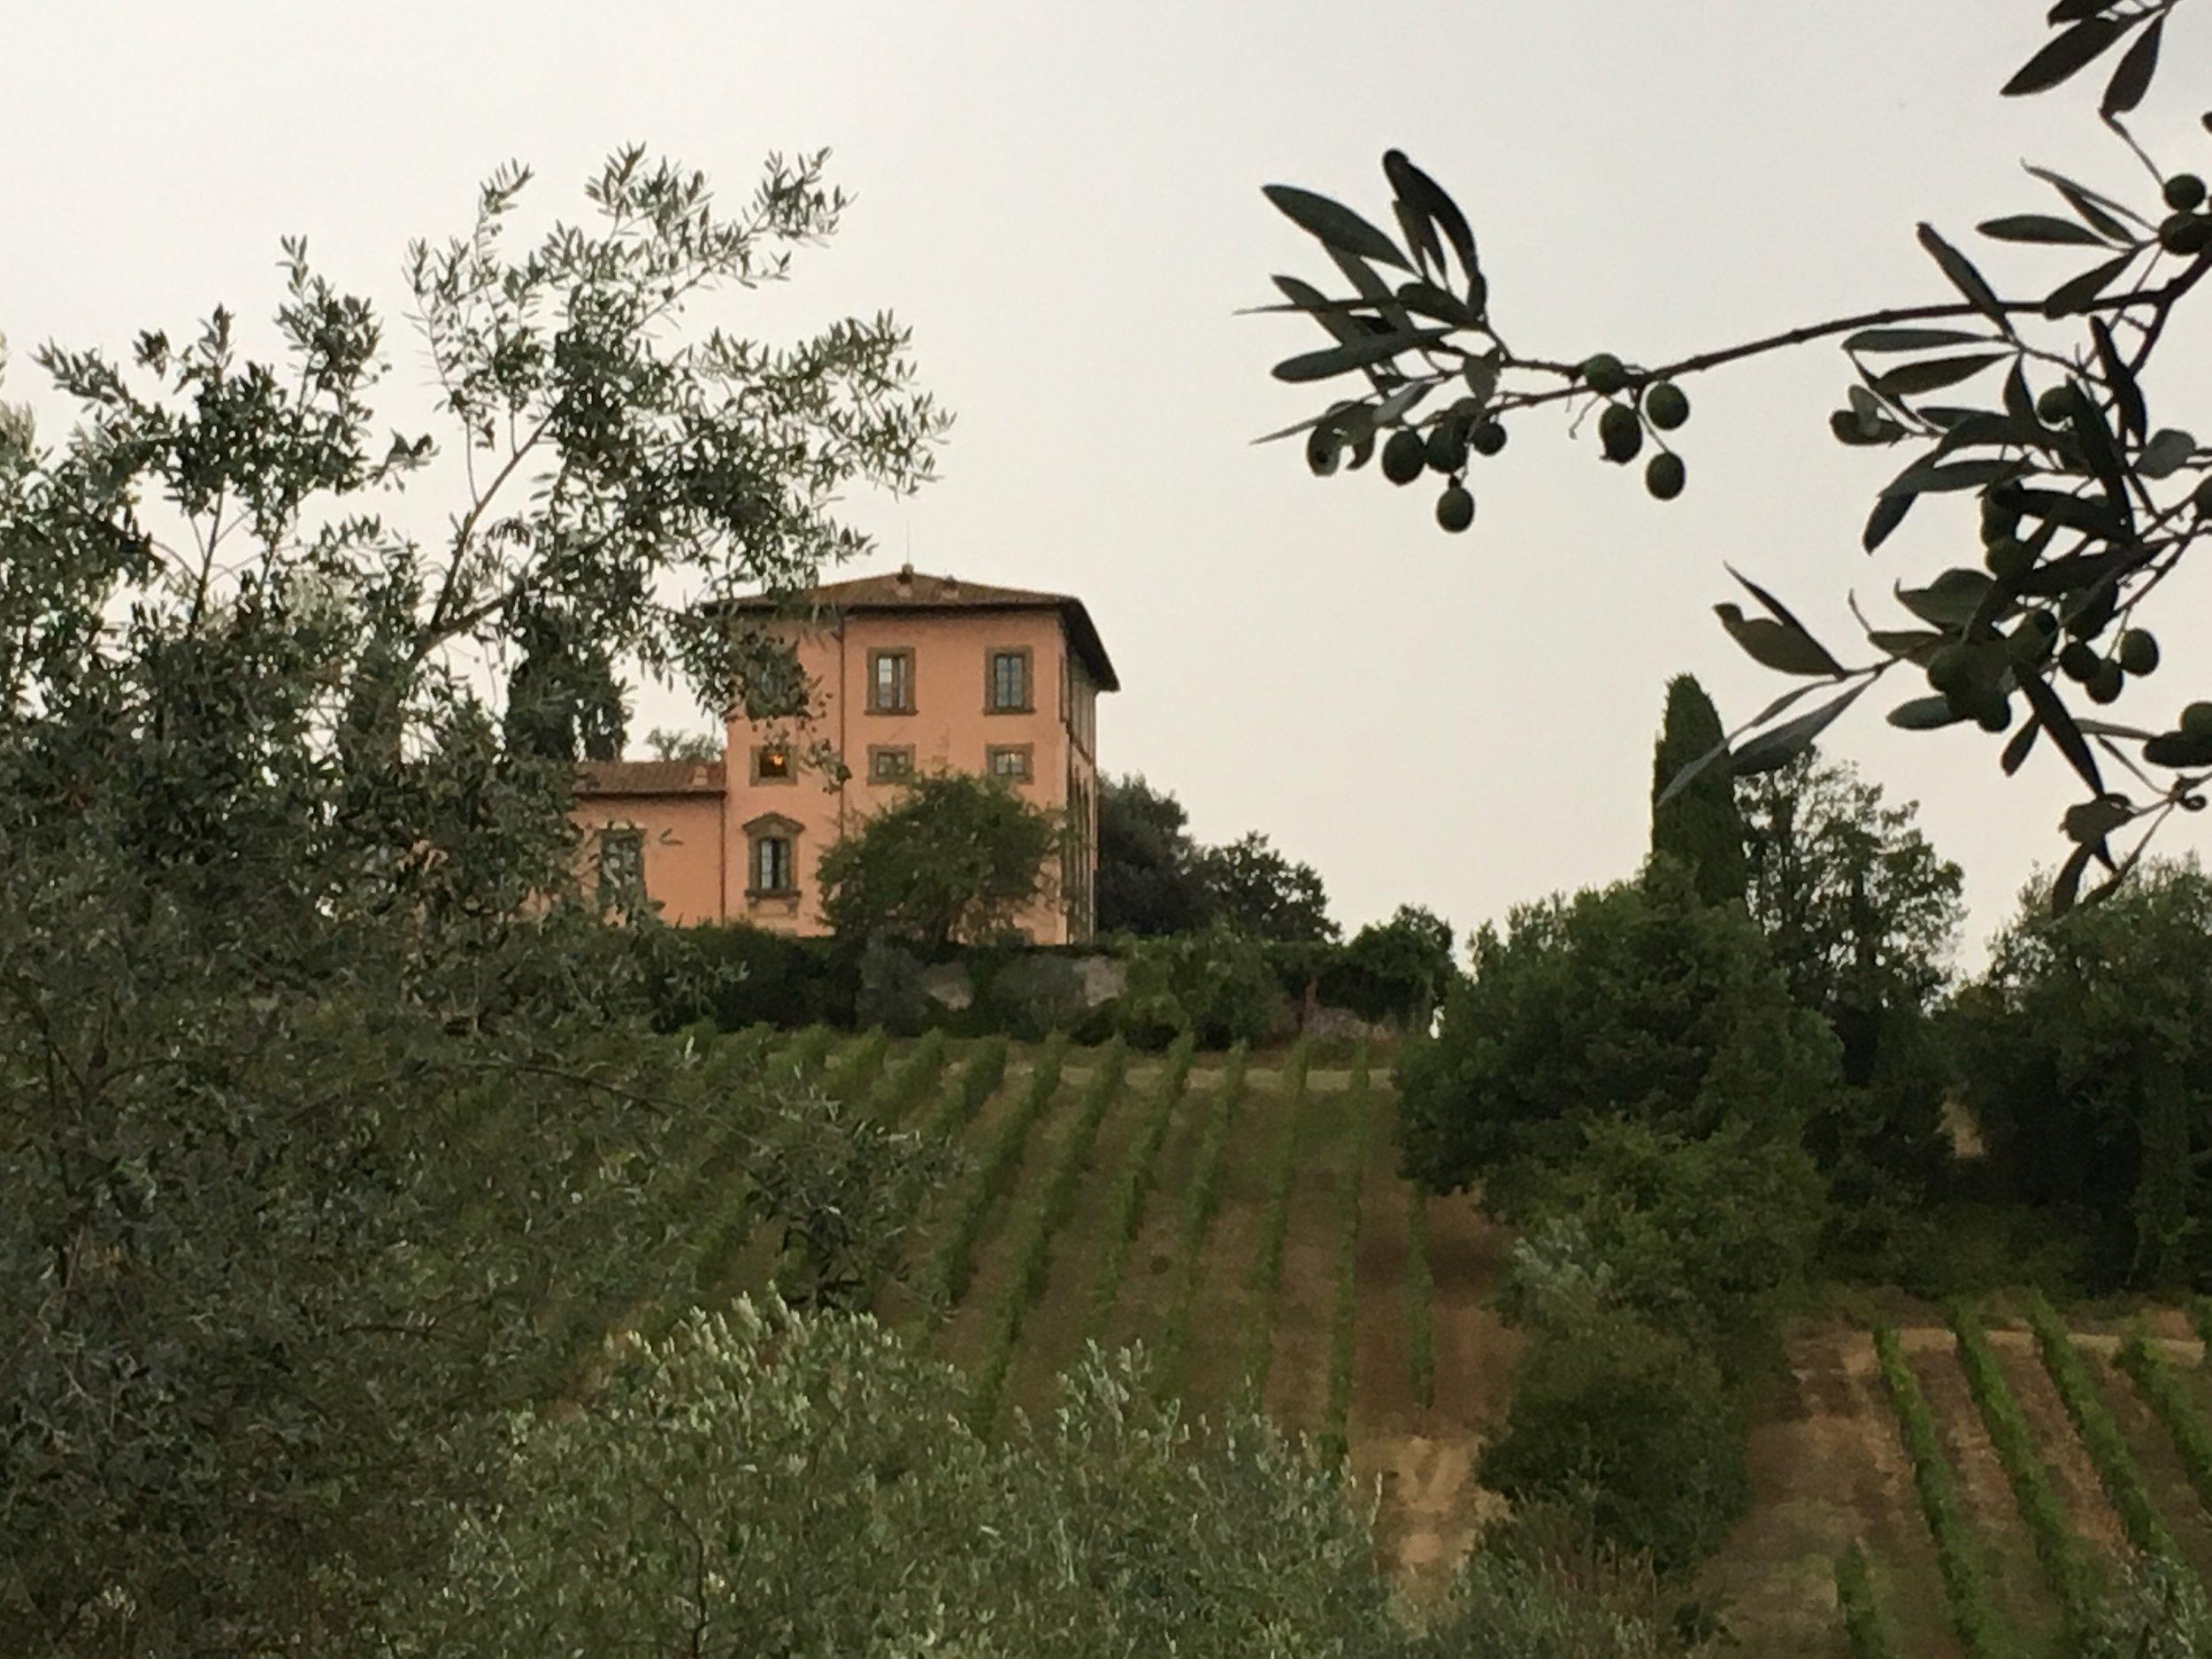 The villa where Tom Hanks stayed